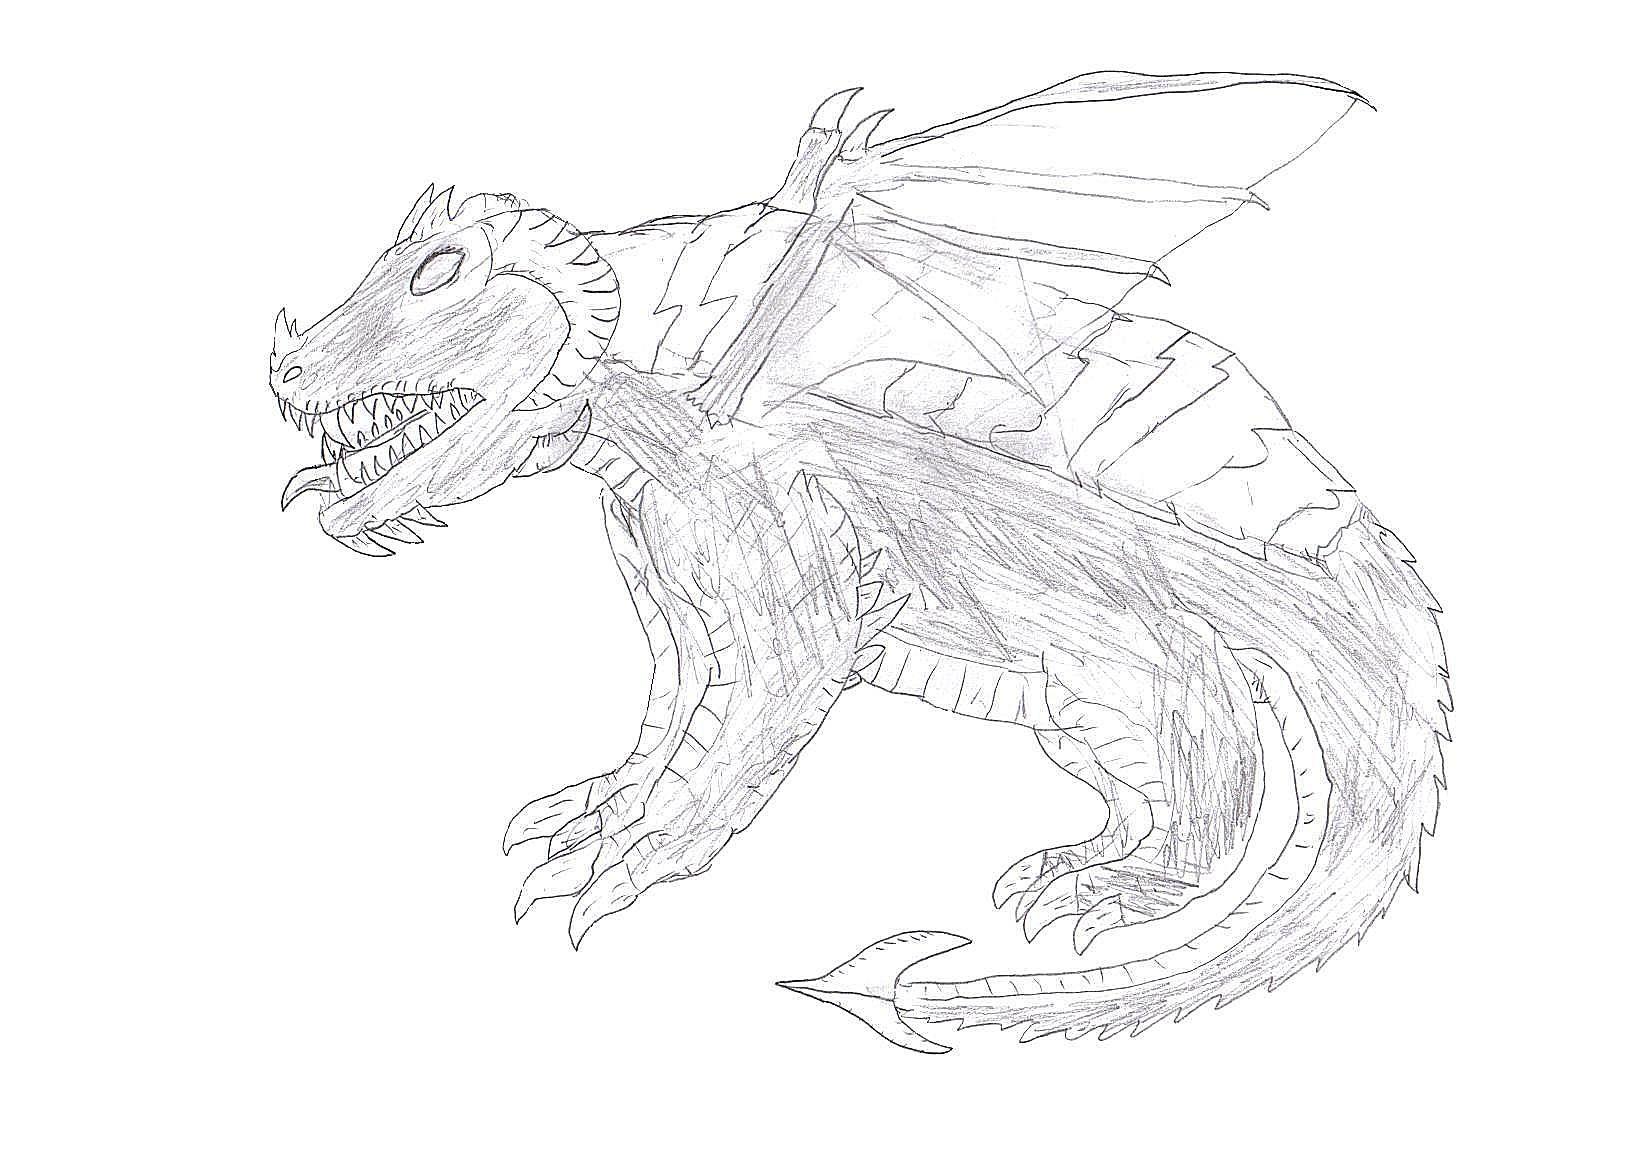 Evil Dragon Request by Dinalfos5 on deviantART